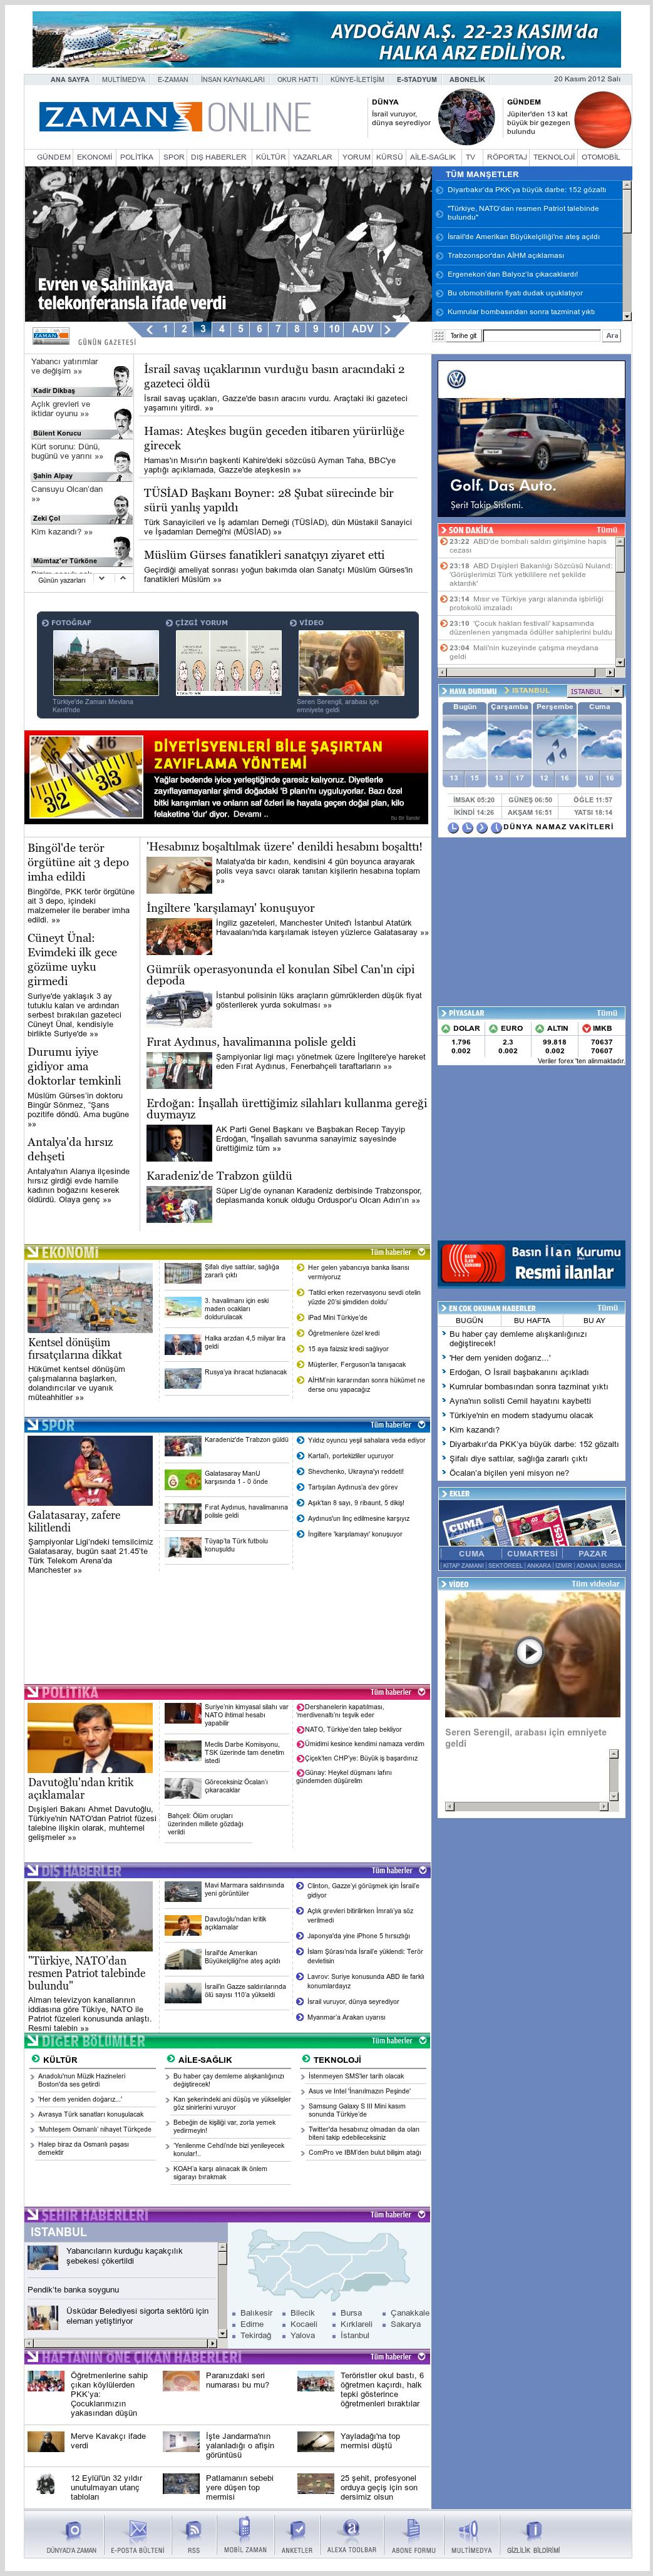 Zaman Online at Tuesday Nov. 20, 2012, 9:37 p.m. UTC